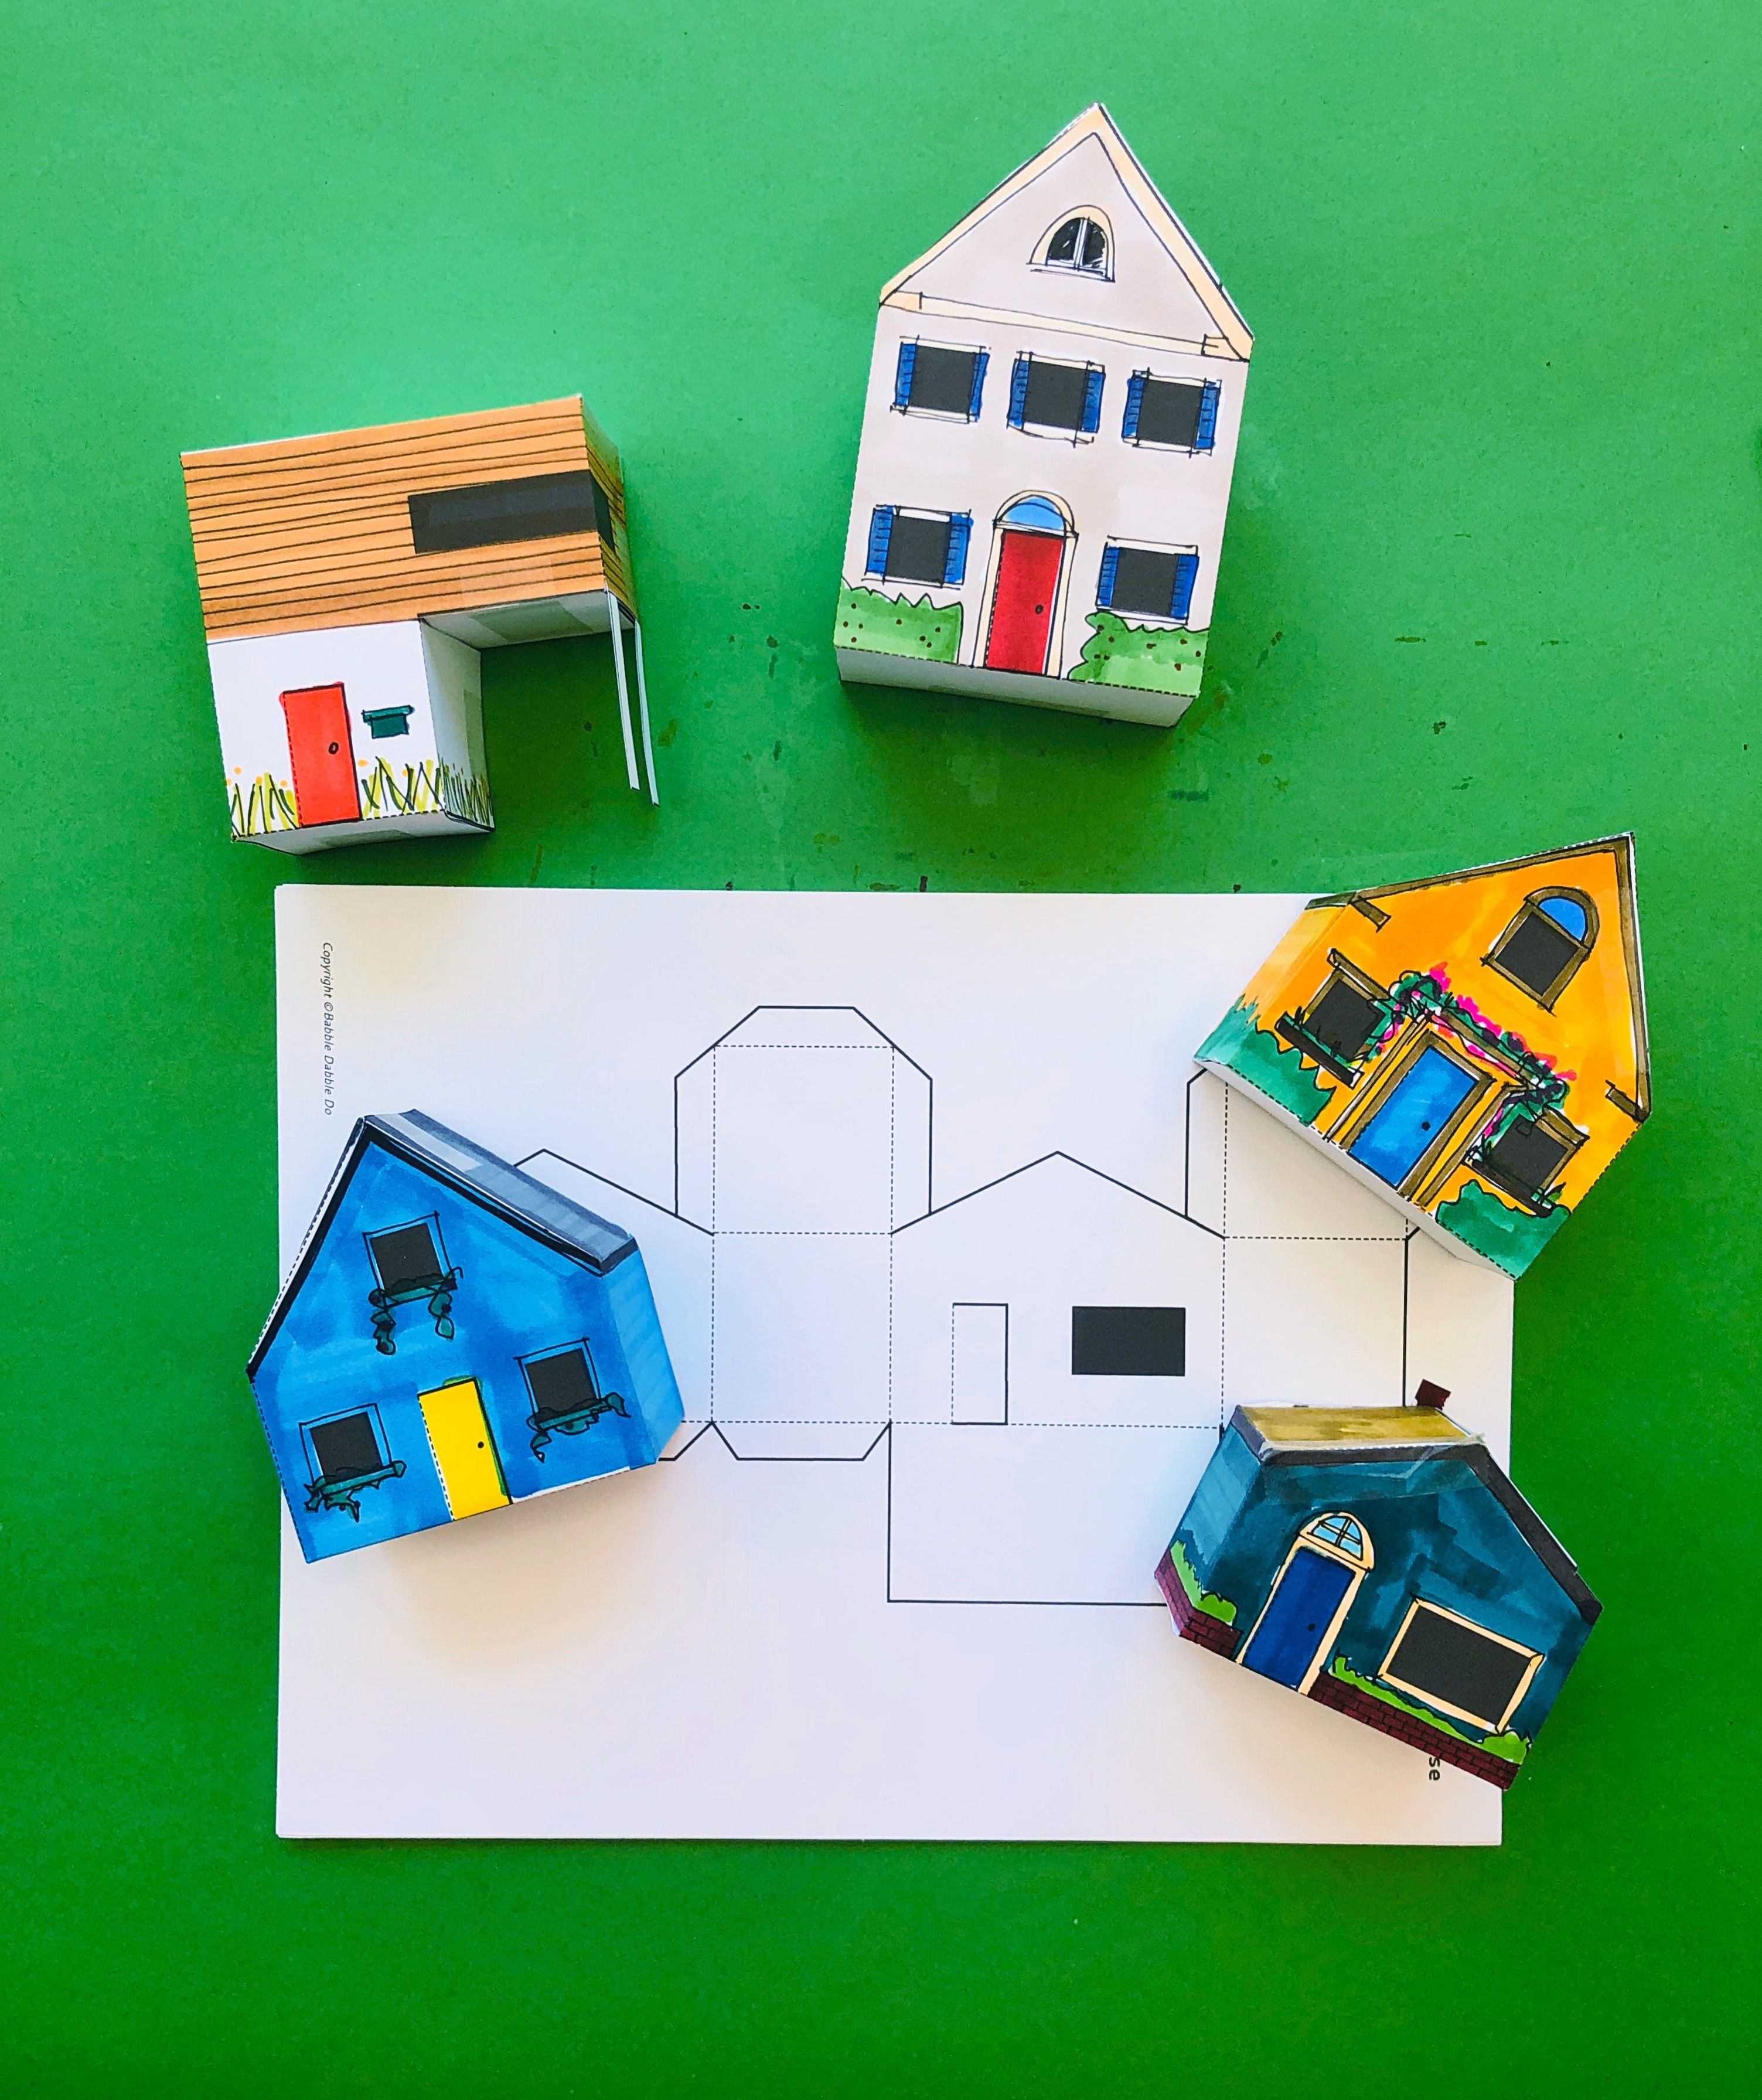 Design for Kids: Paper Houses